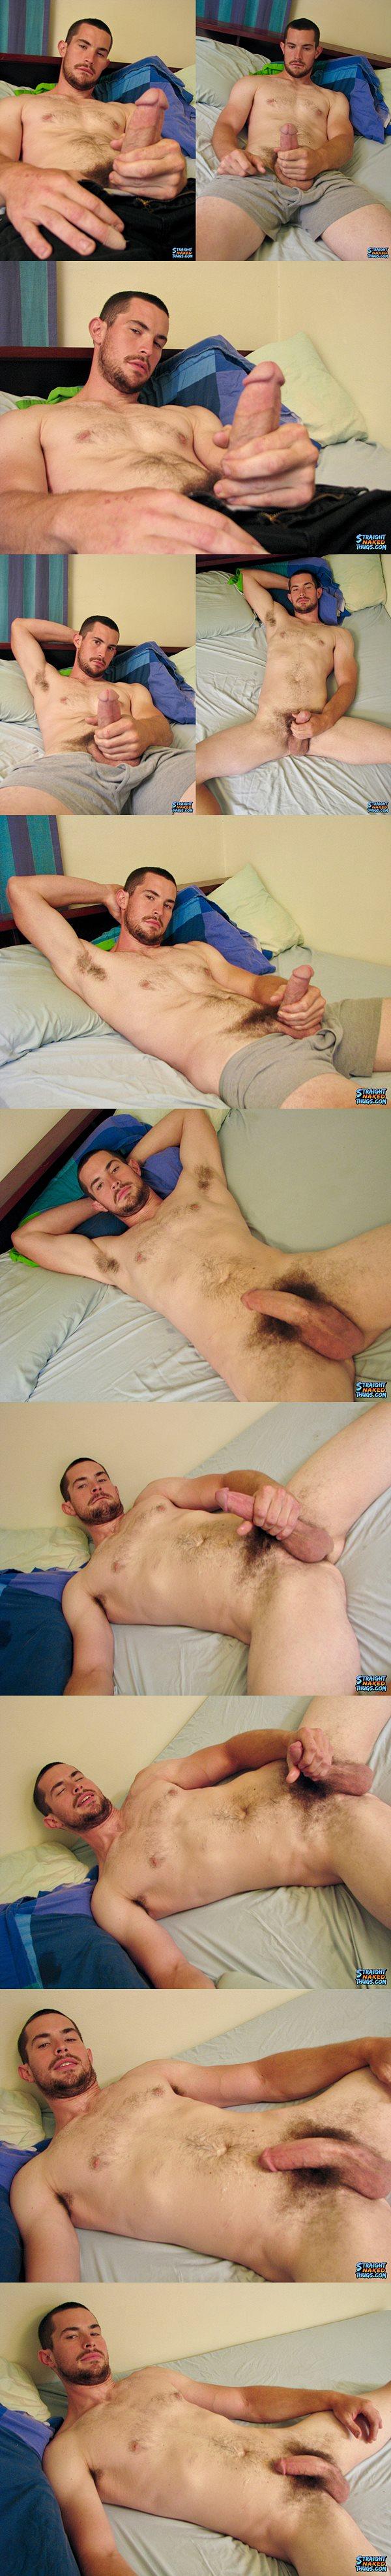 Rugged handsome straight muscle jock Hunter at Straightnakedthugs